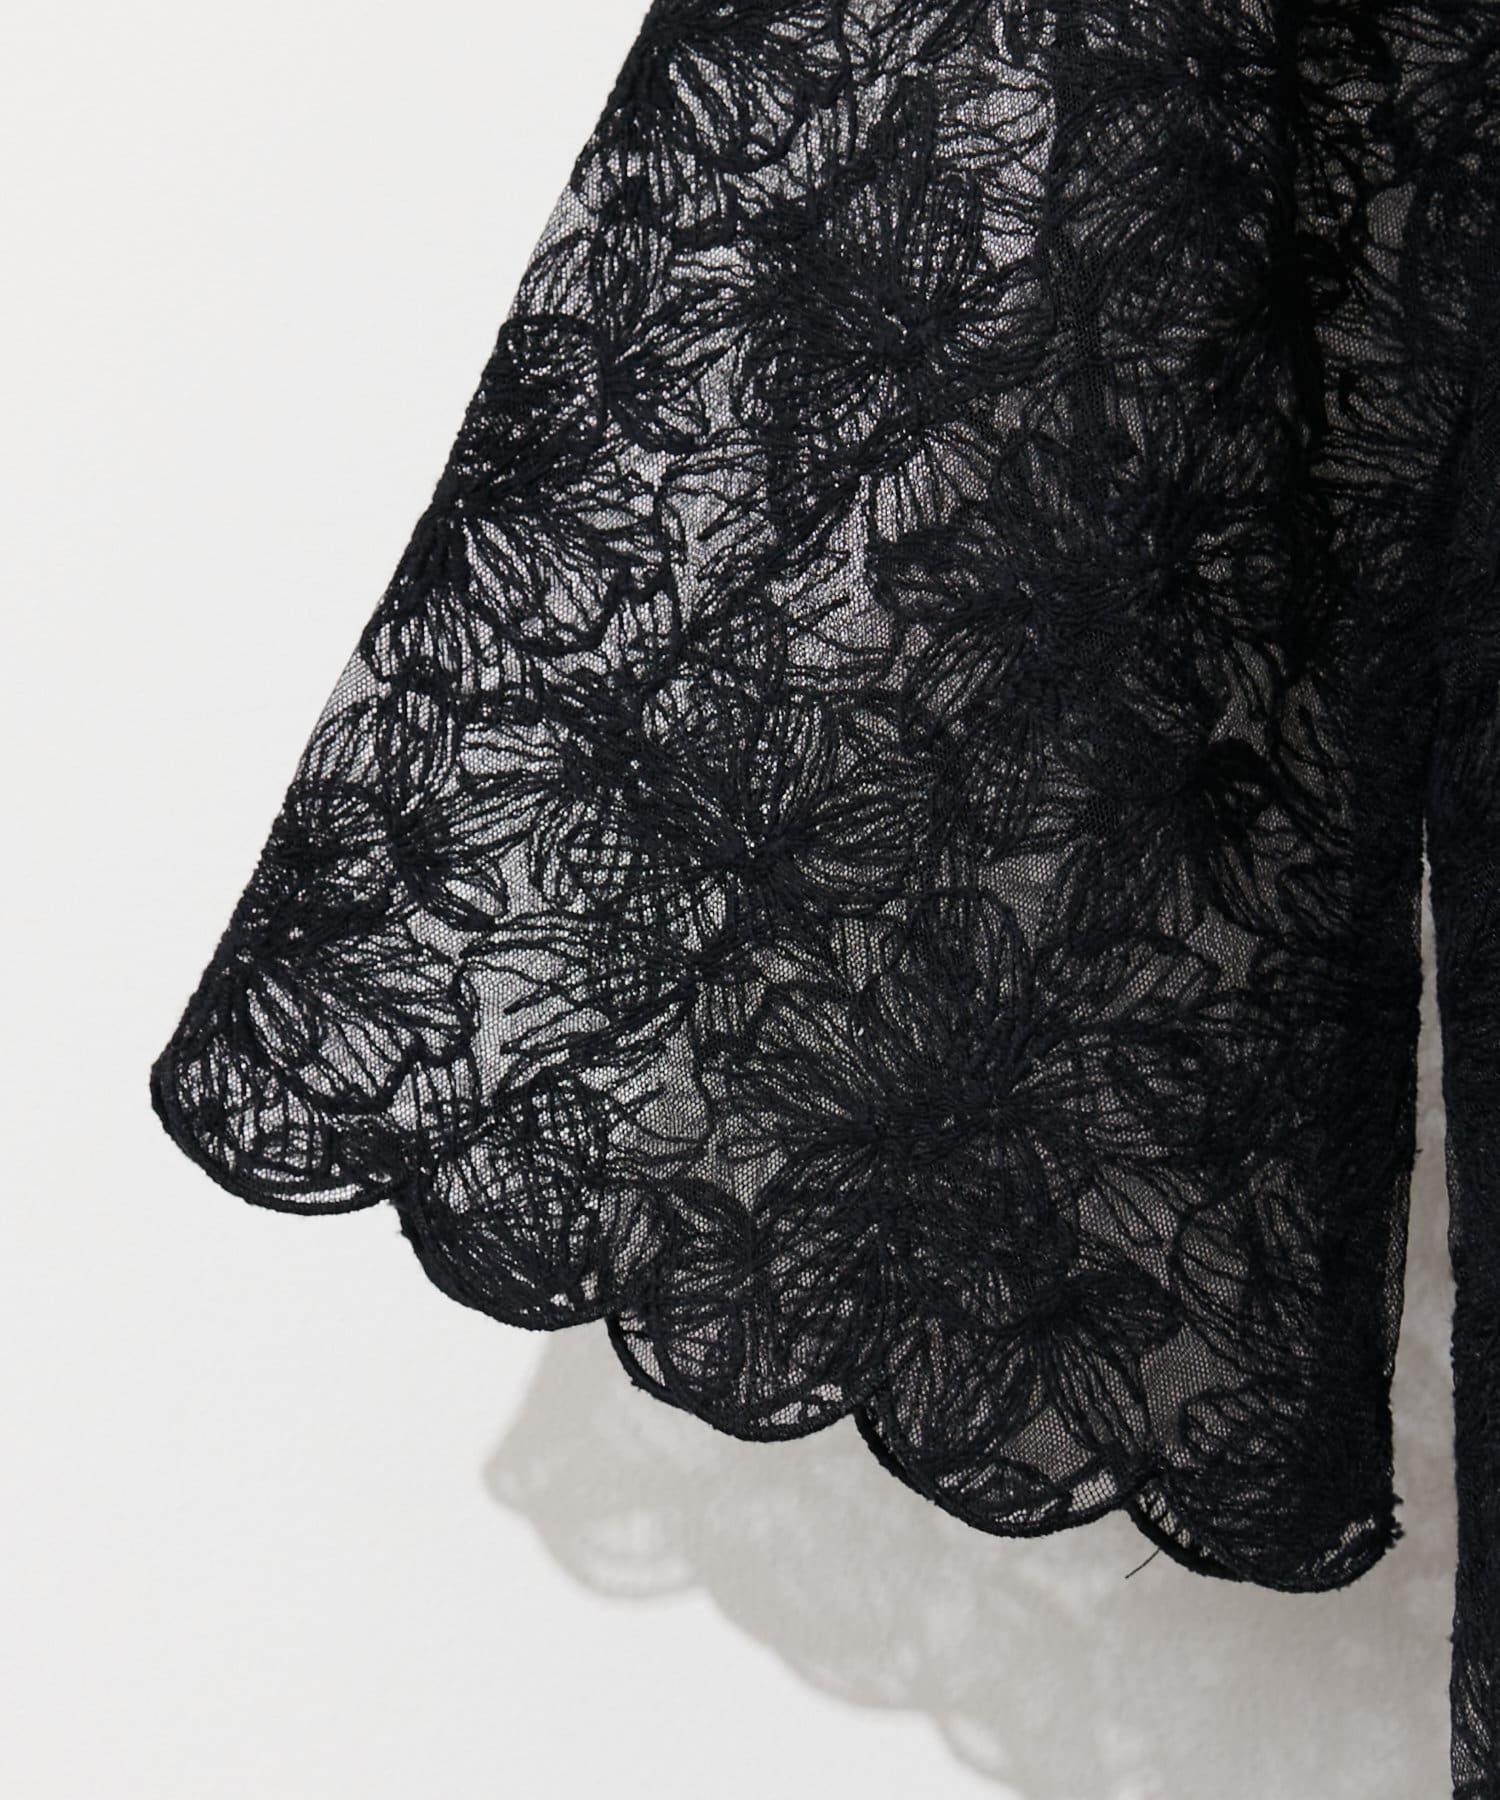 natural couture(ナチュラルクチュール) 袖口スカラップフラワーレースブラウス